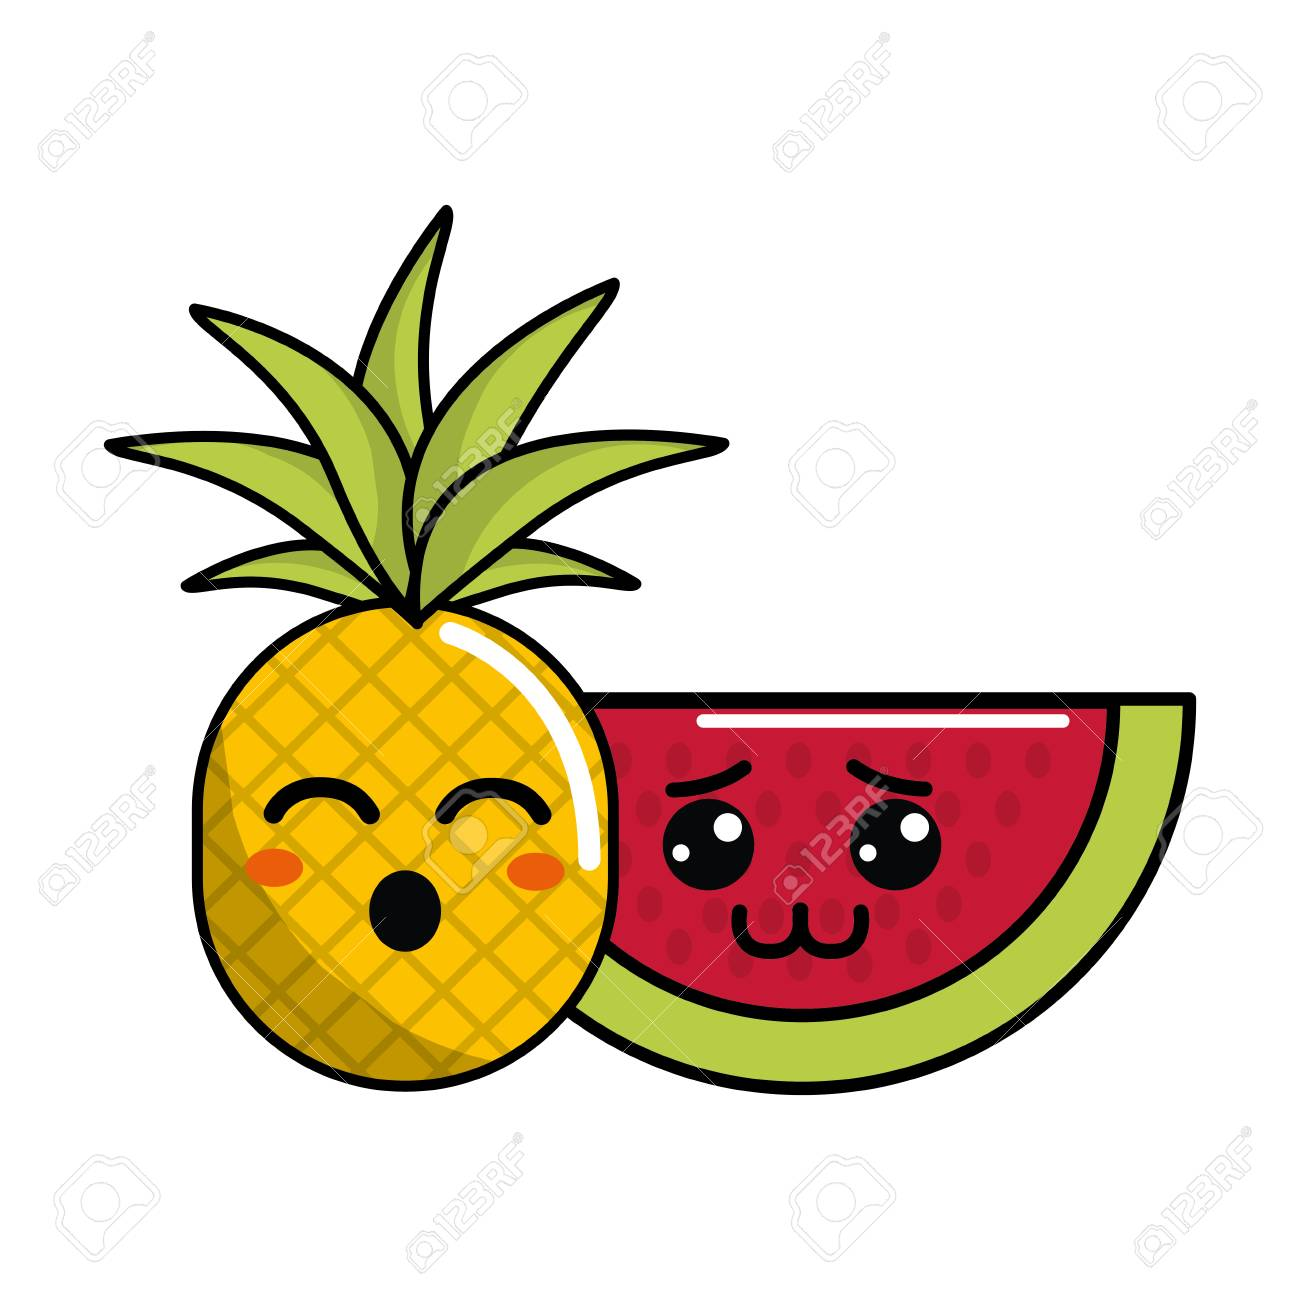 Cute Kawaii Funny Pineapple And Shy Watermelon Icon Stock Vector